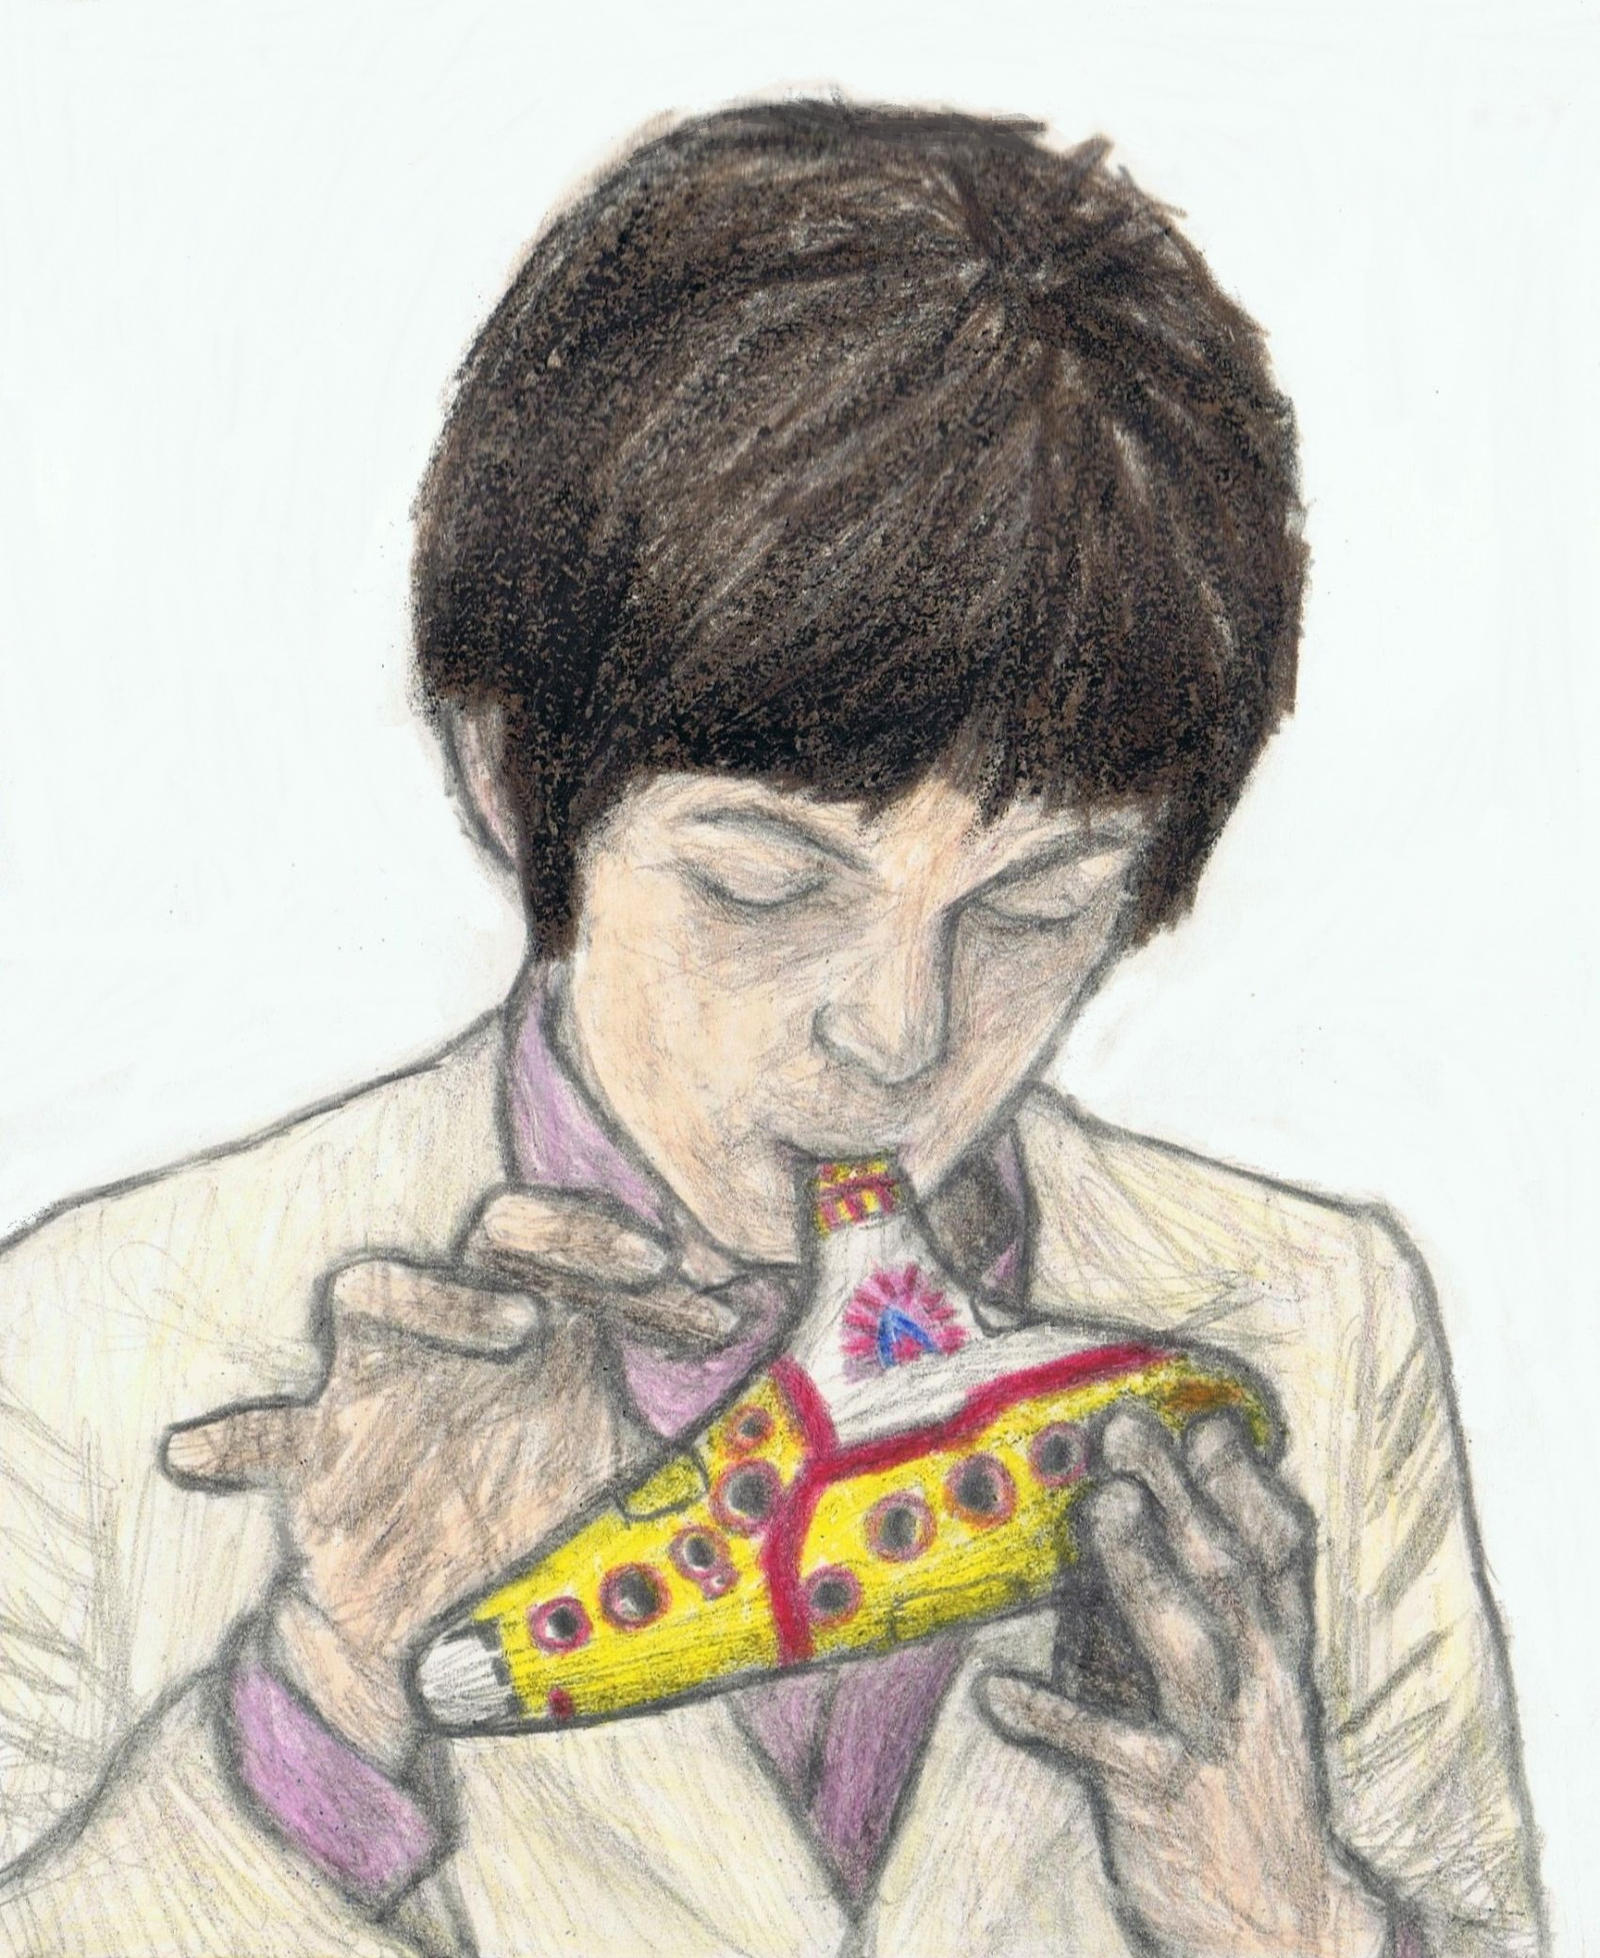 Paul McCartney on ocarina by gagambo